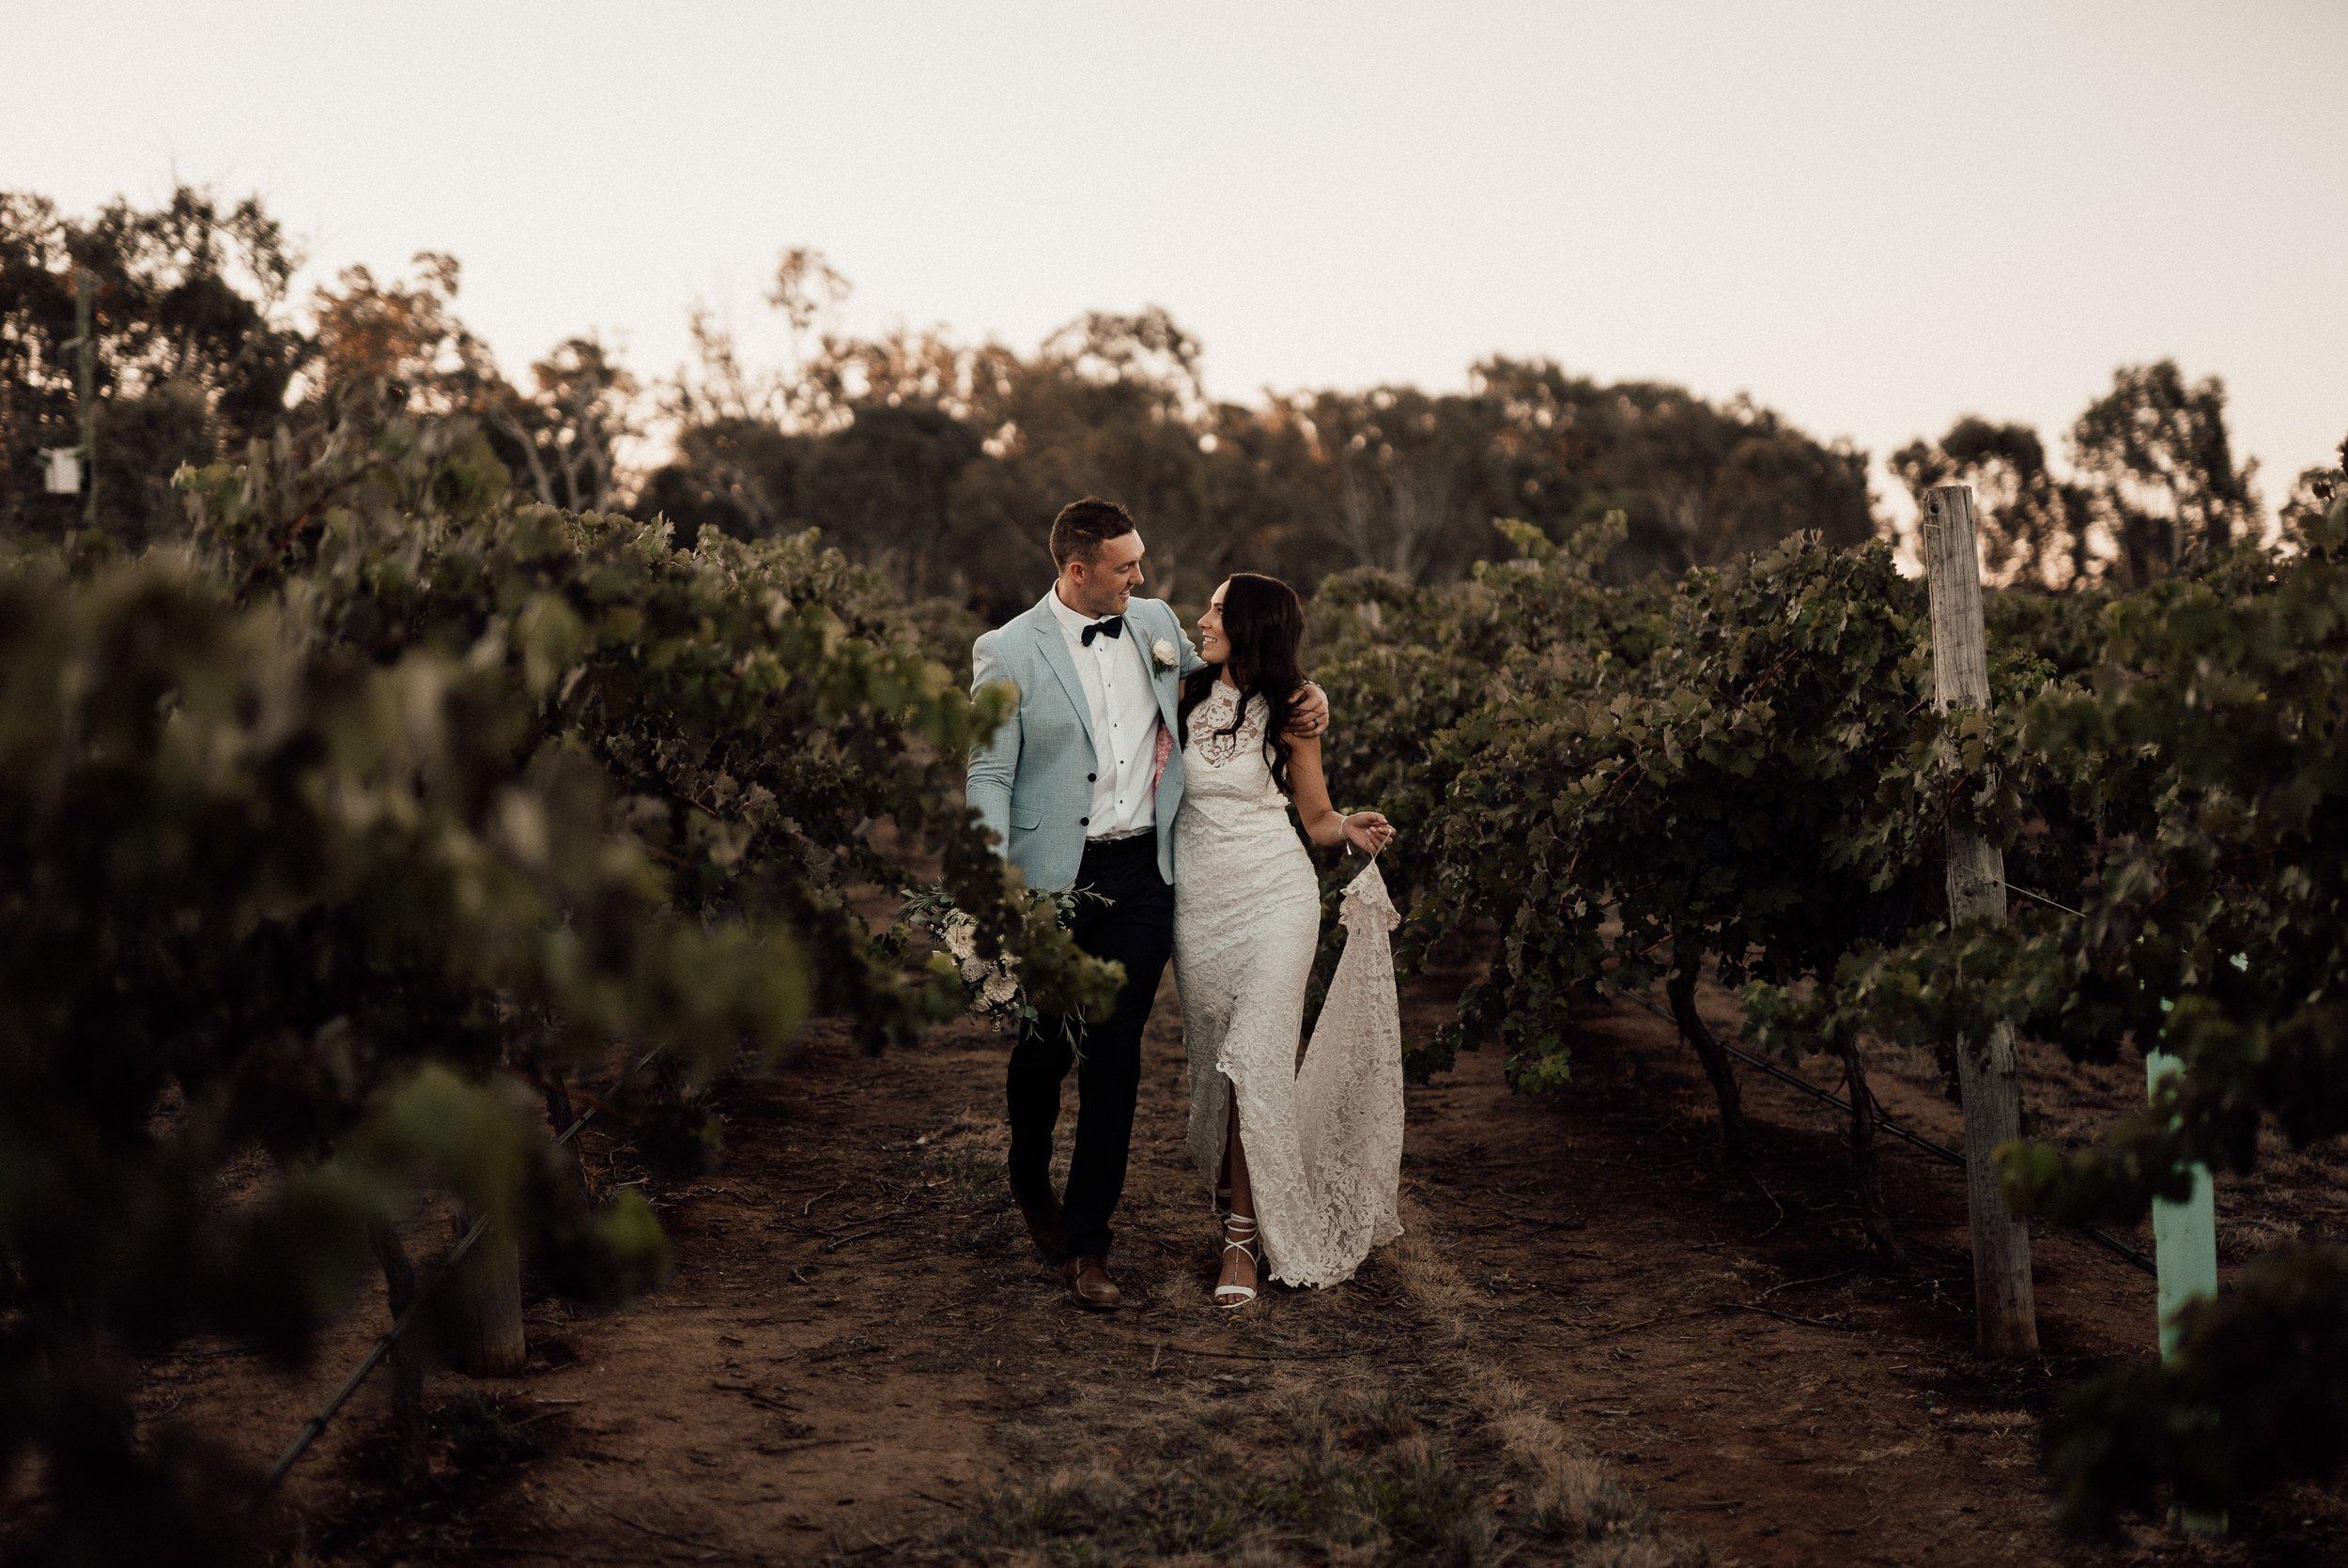 mickalathomas_puremacphotography_weddingphotographer_couplephotographer_Sheppartonphotographer_2922.jpg